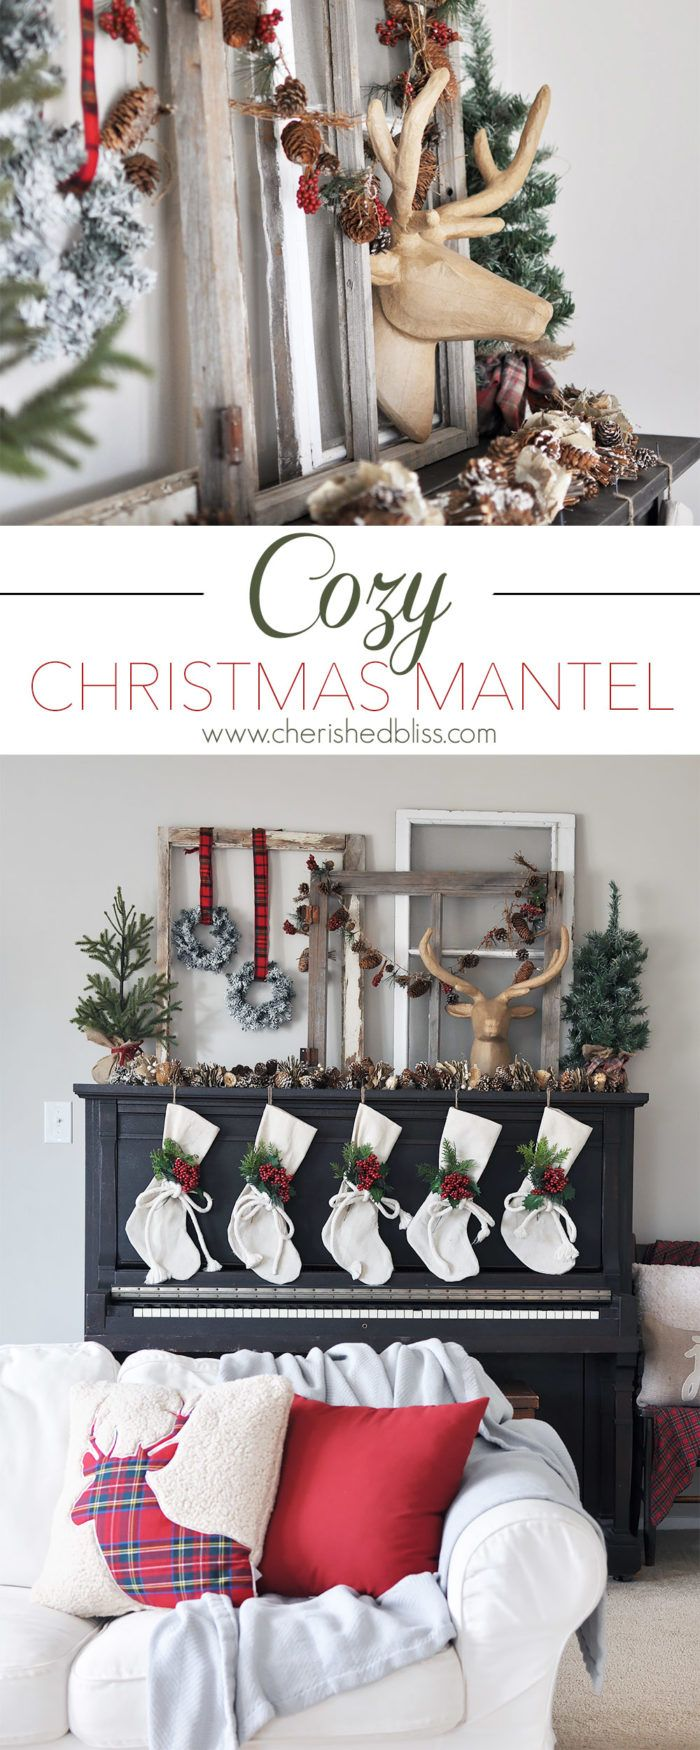 DIY Christmas Mantel and Decor Ideas 7